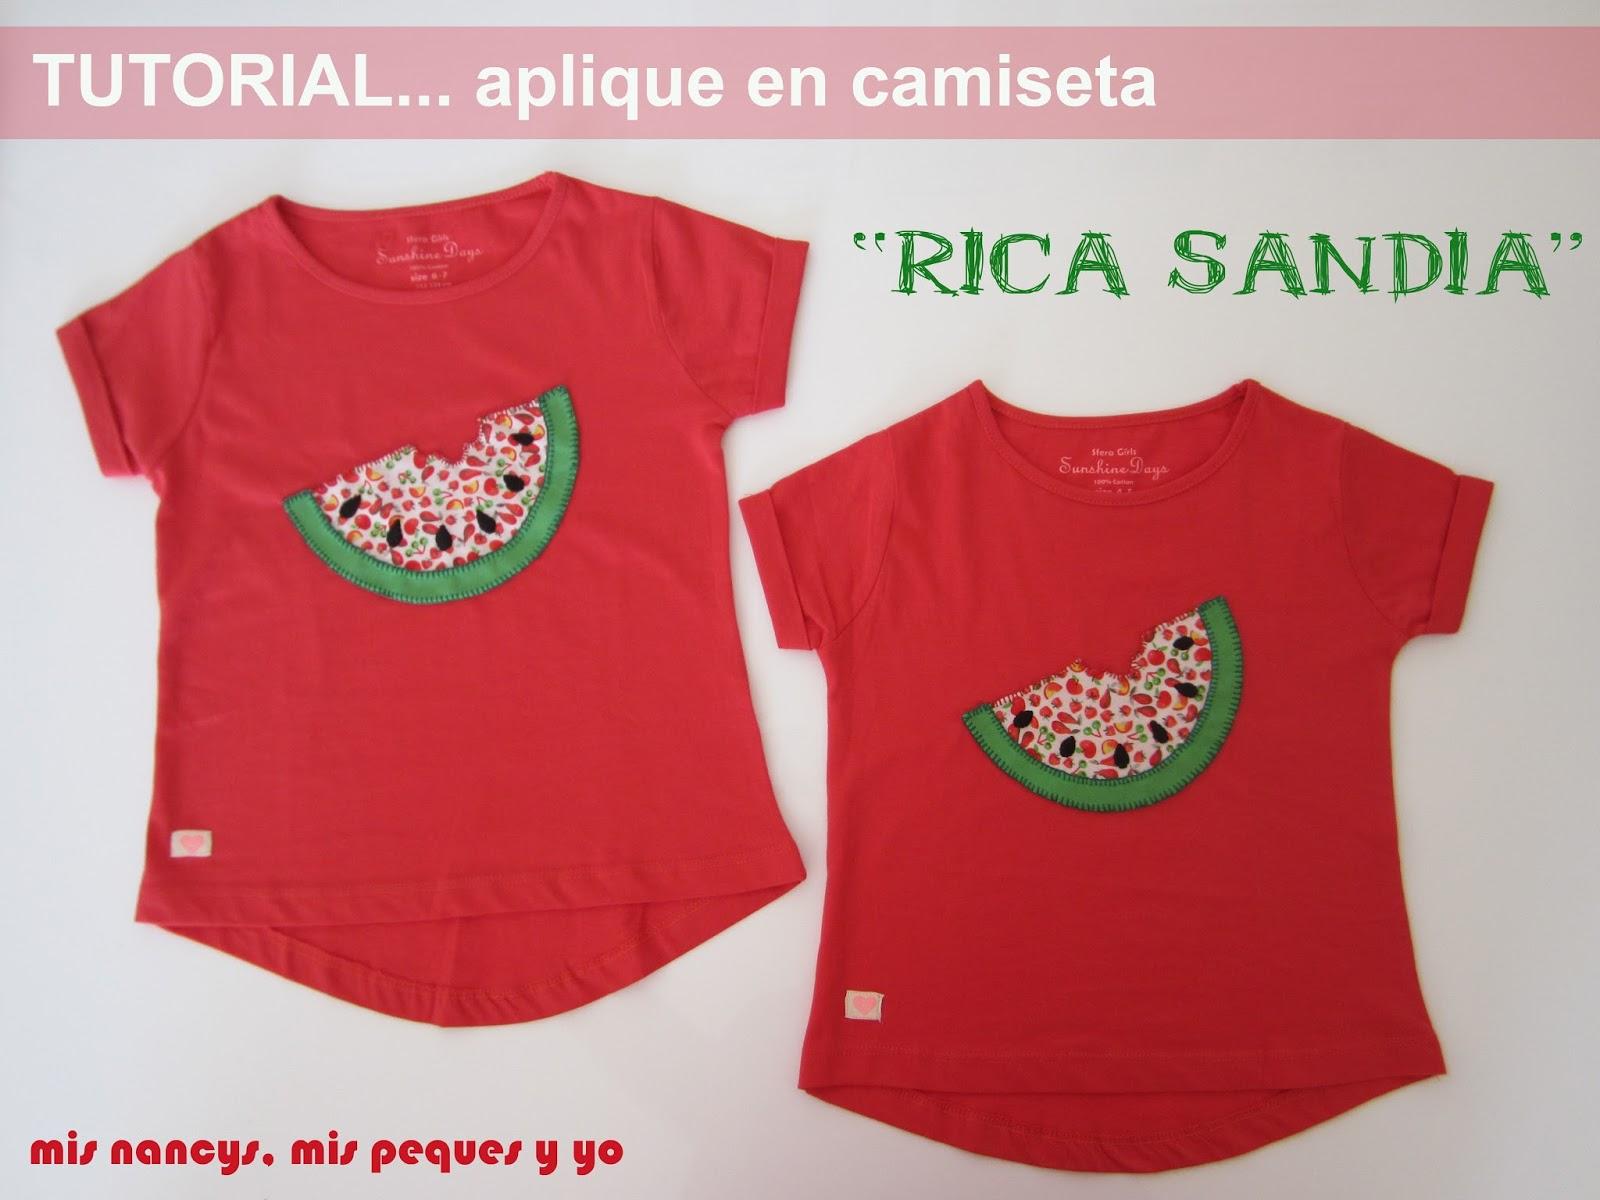 "Tutorial Aplique en camiseta…""Rica Sand?a"""